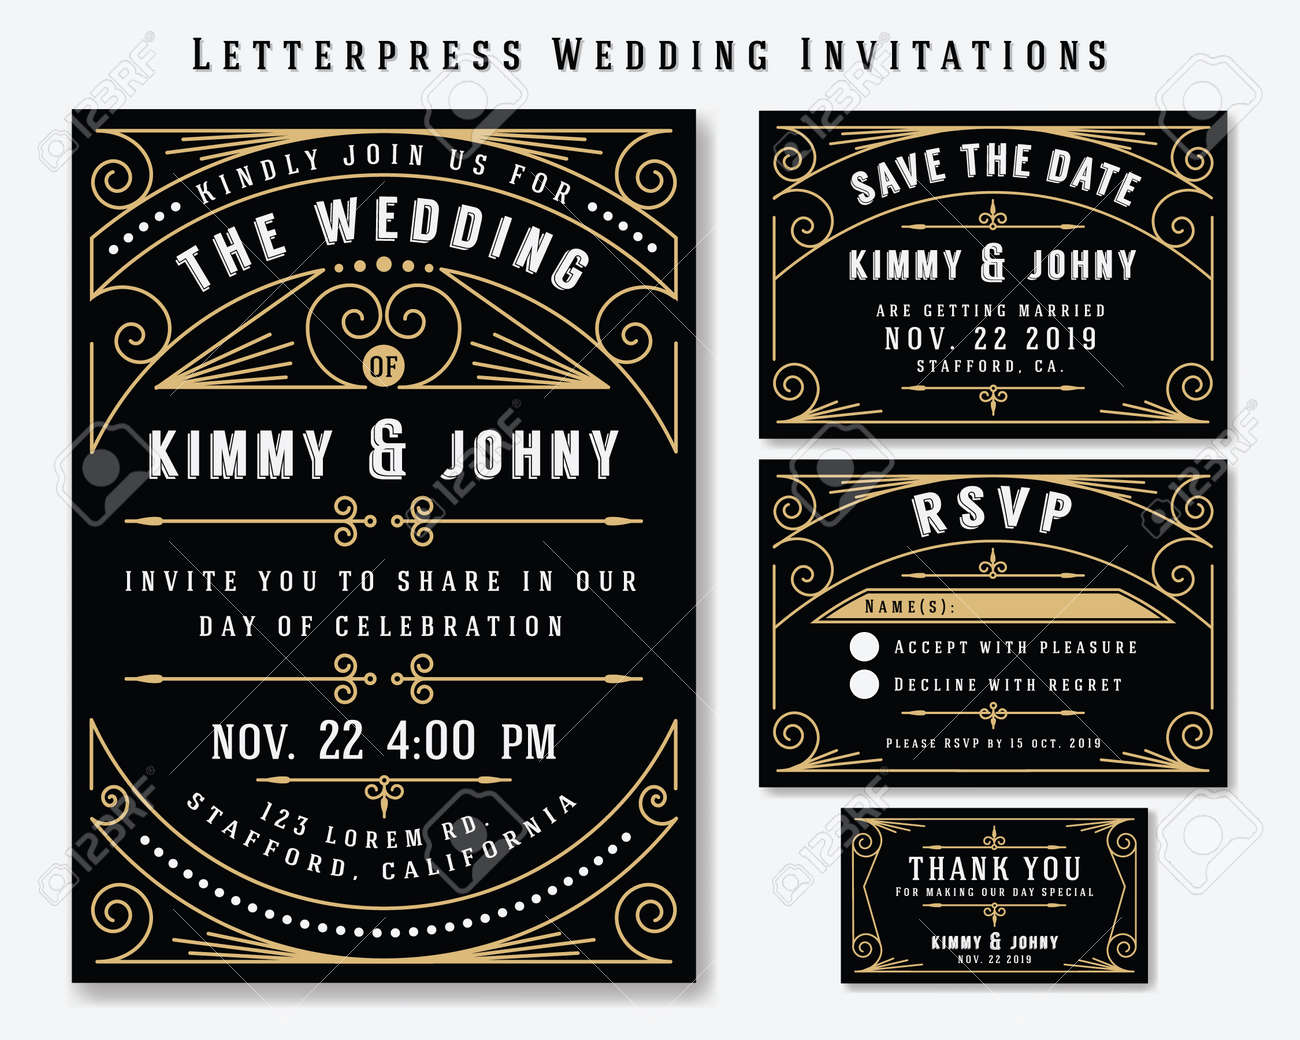 Letterpress Wedding Invitation Design Template Include Rsvp